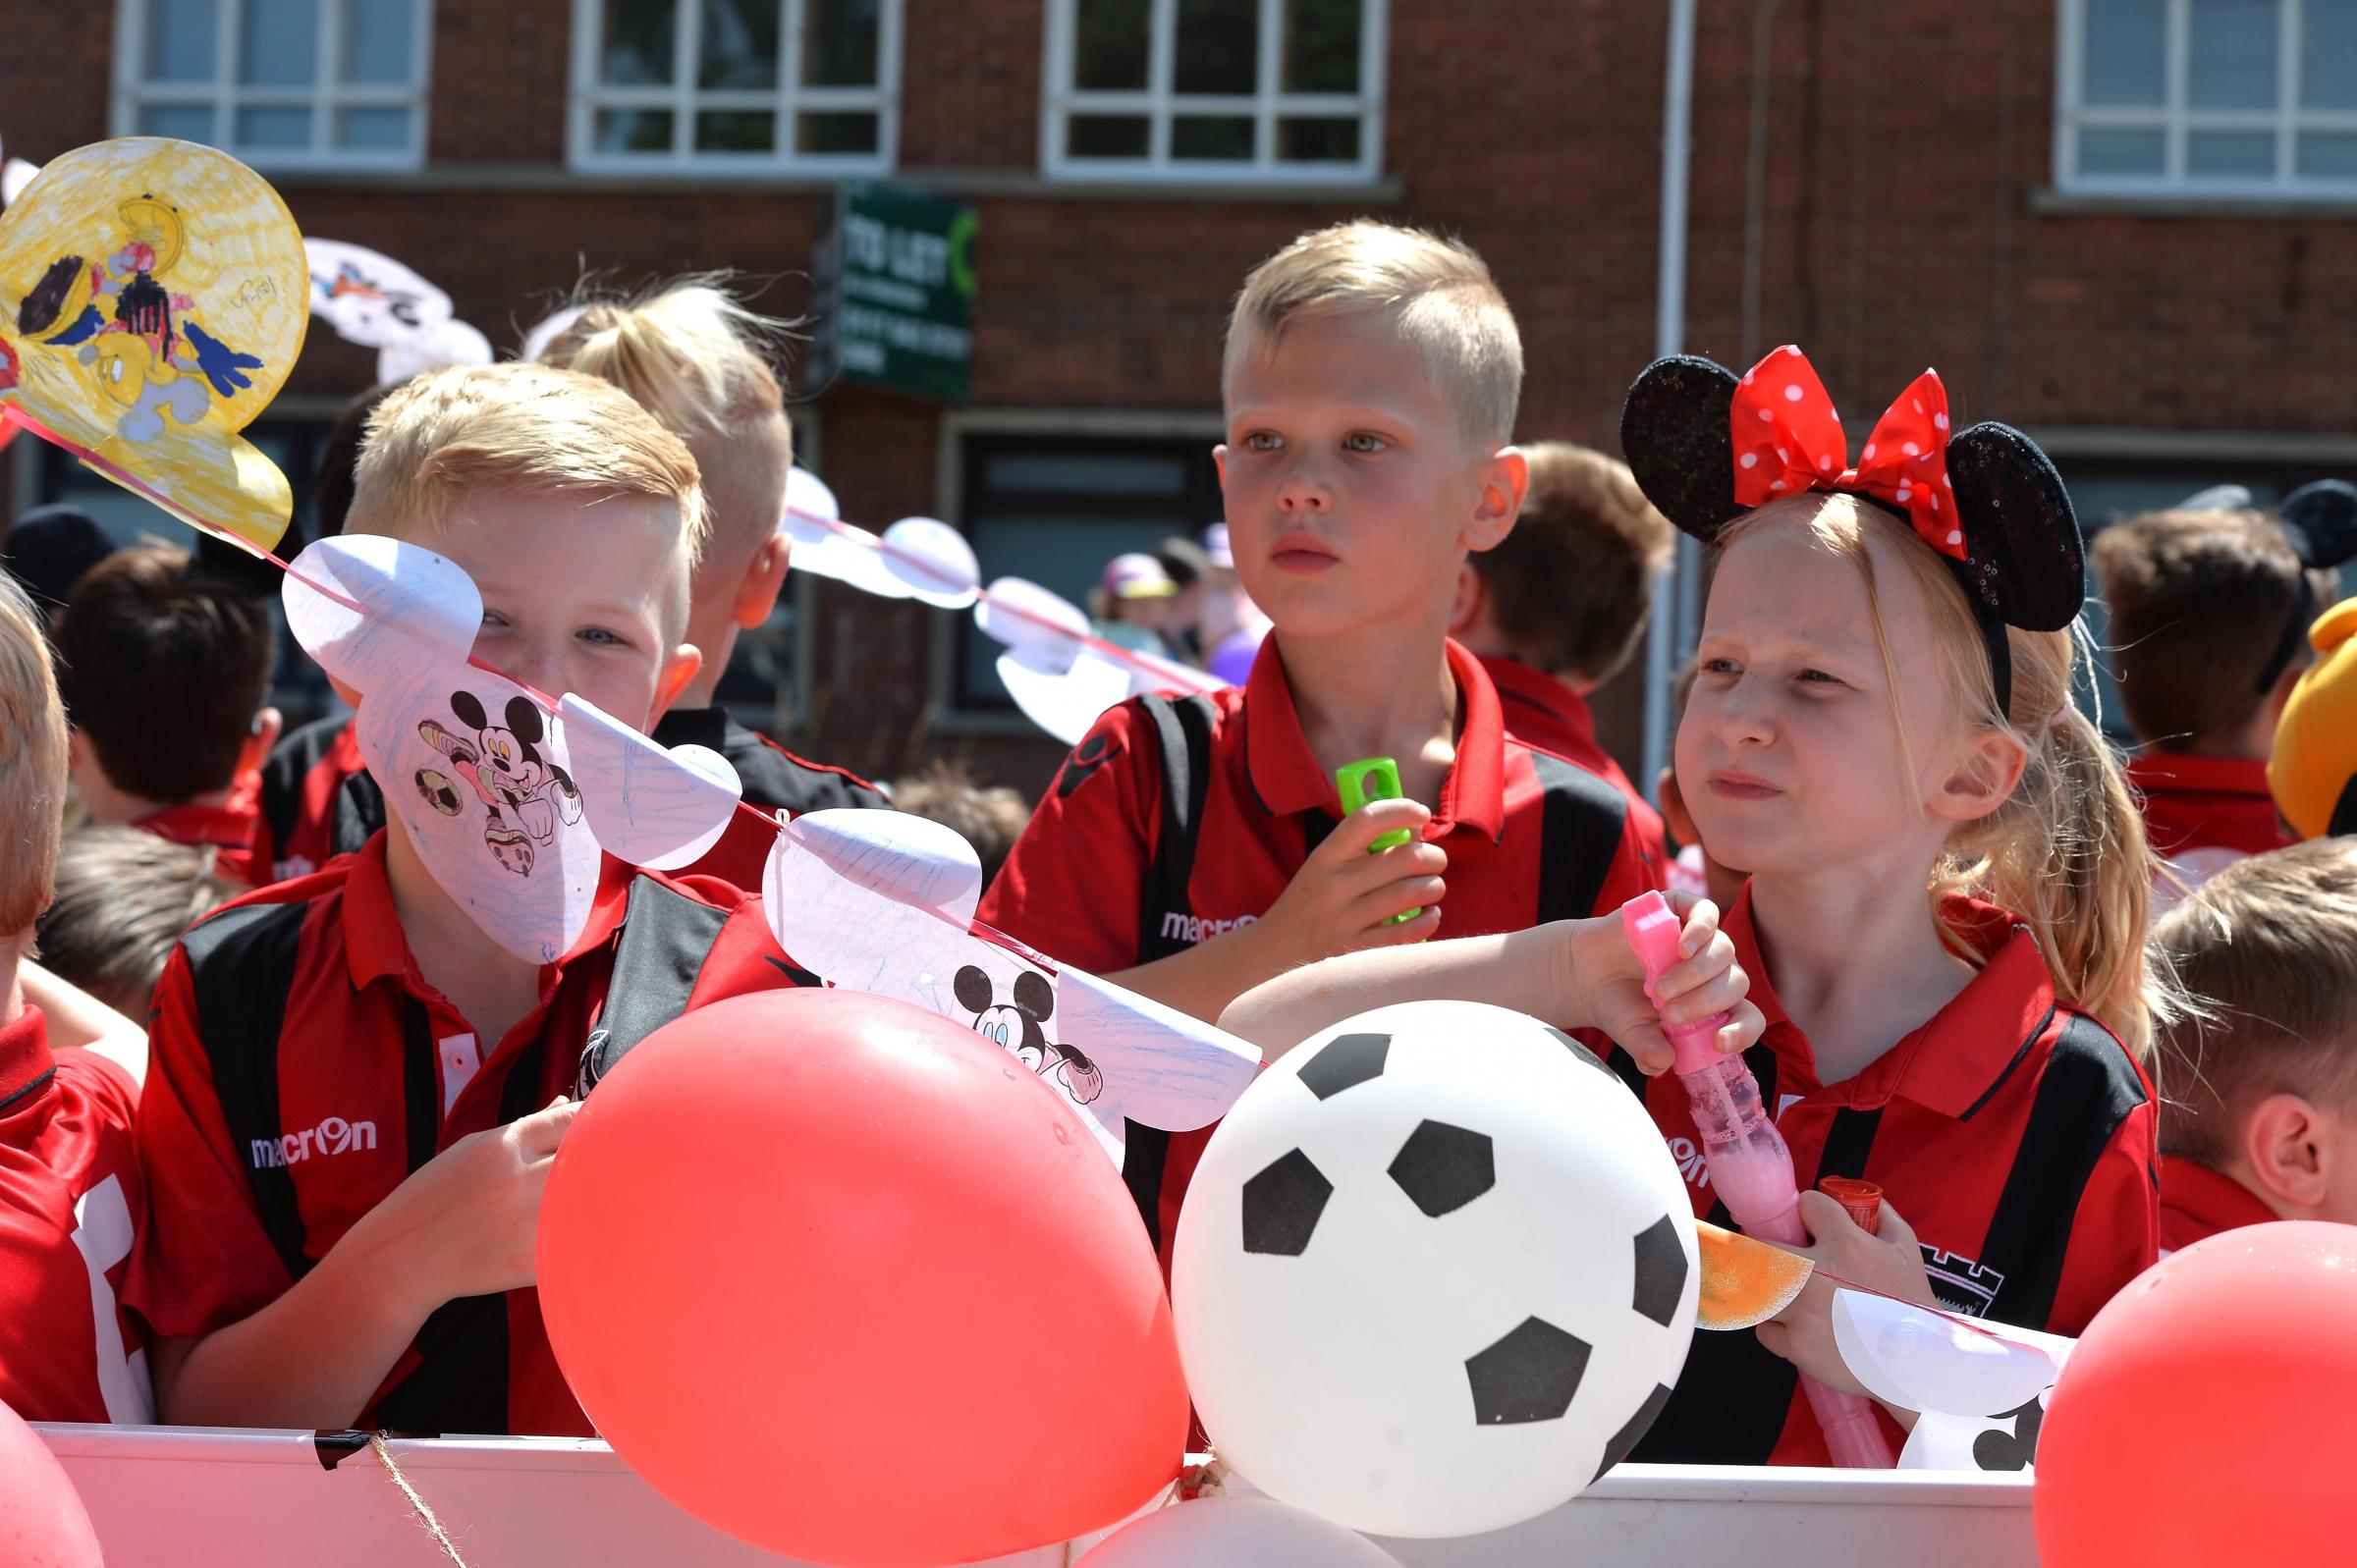 Caldicot town carnival prizes